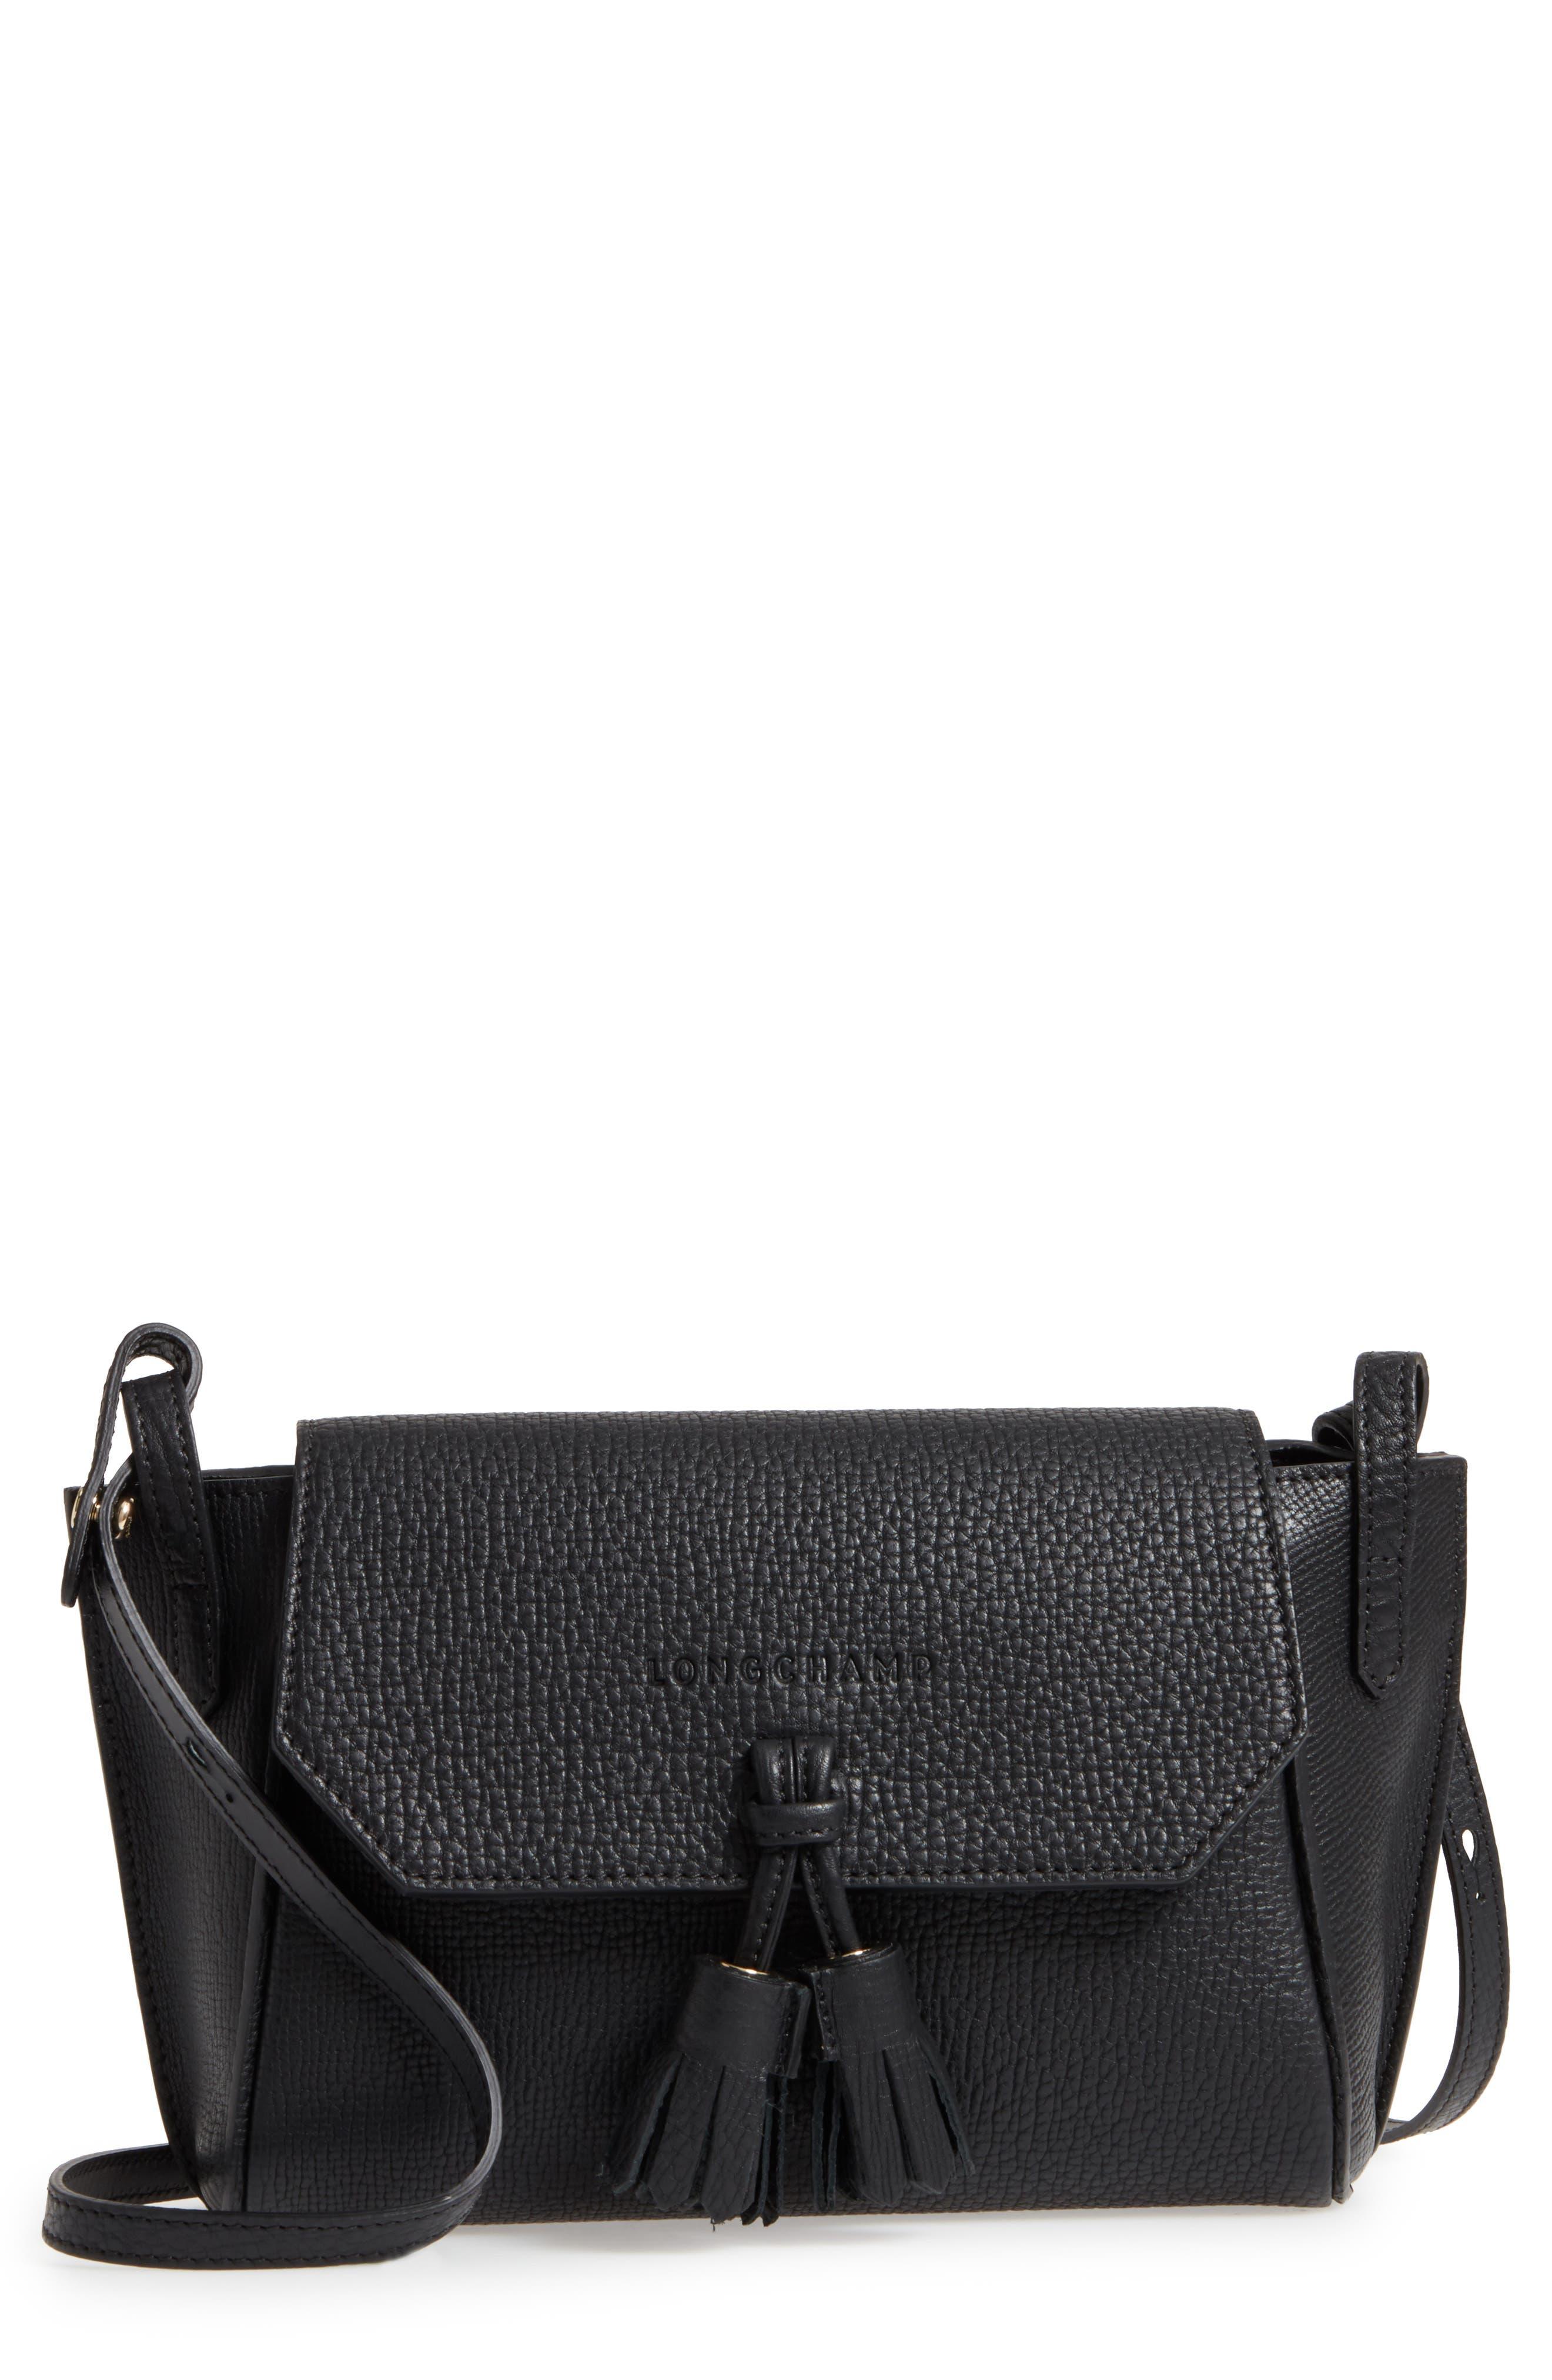 Longchamp Penelope Leather Crossbody Bag